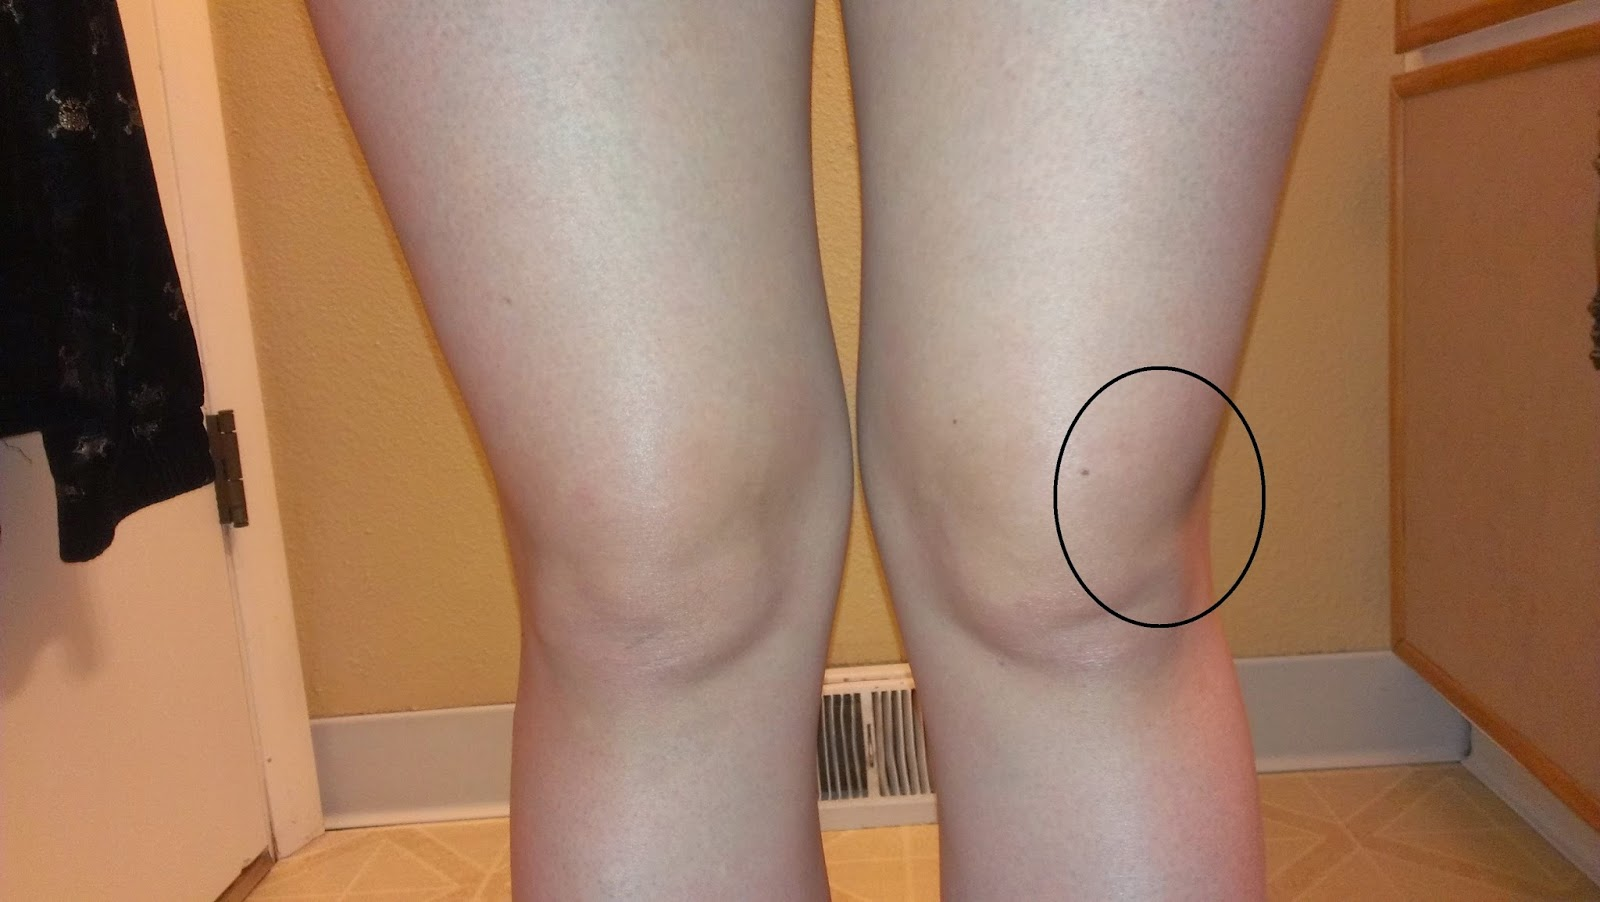 tratament ortopedic articular artroza prognosticului tratamentului gleznei